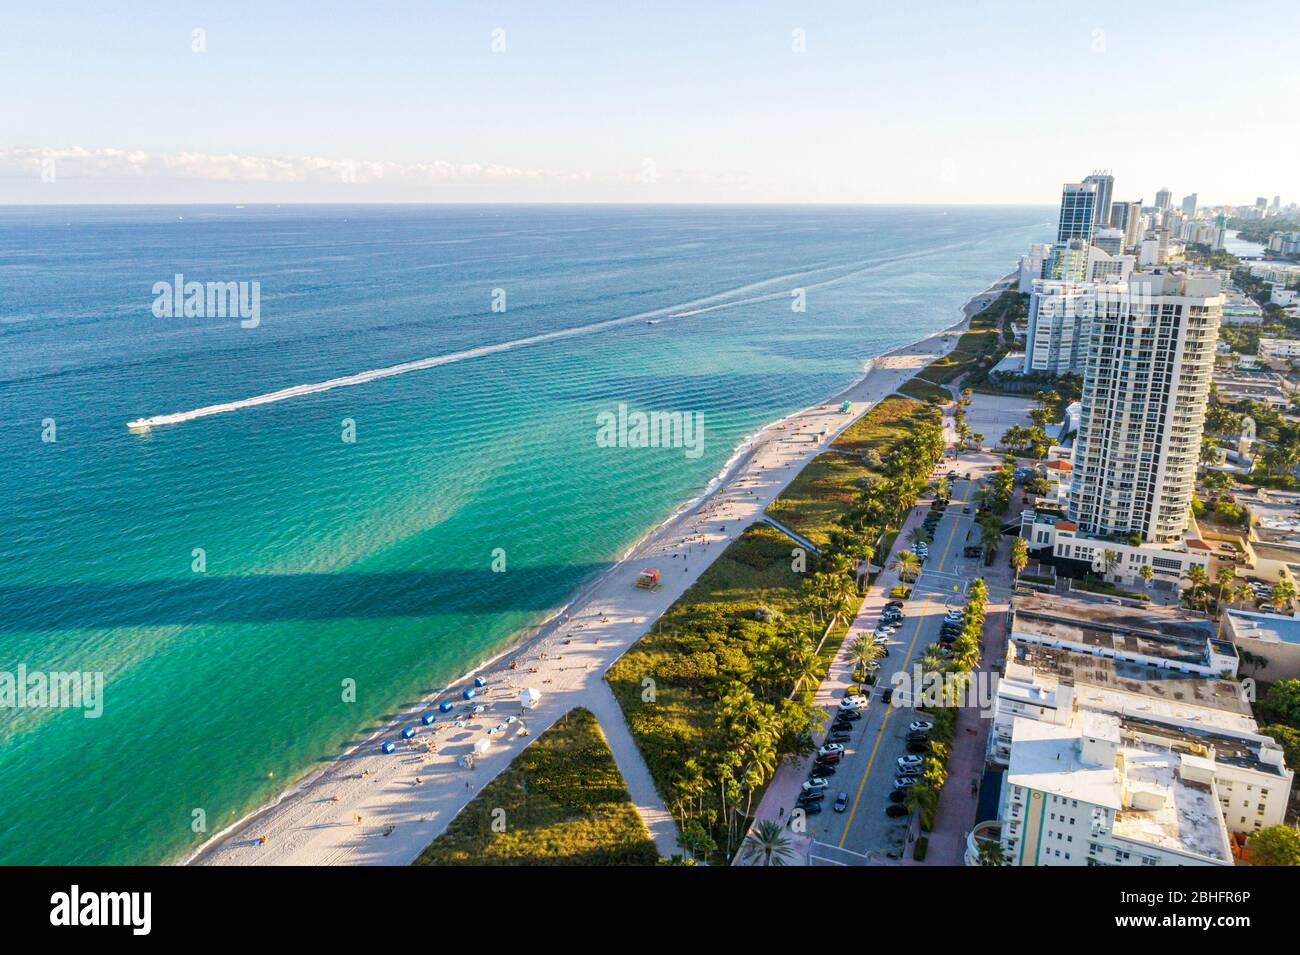 Florida Miami Beach Océano Atlántico público aérea vista aérea Vista sobre North Beach arena agua surf residencial de gran altura edificio de condominios Foto de stock